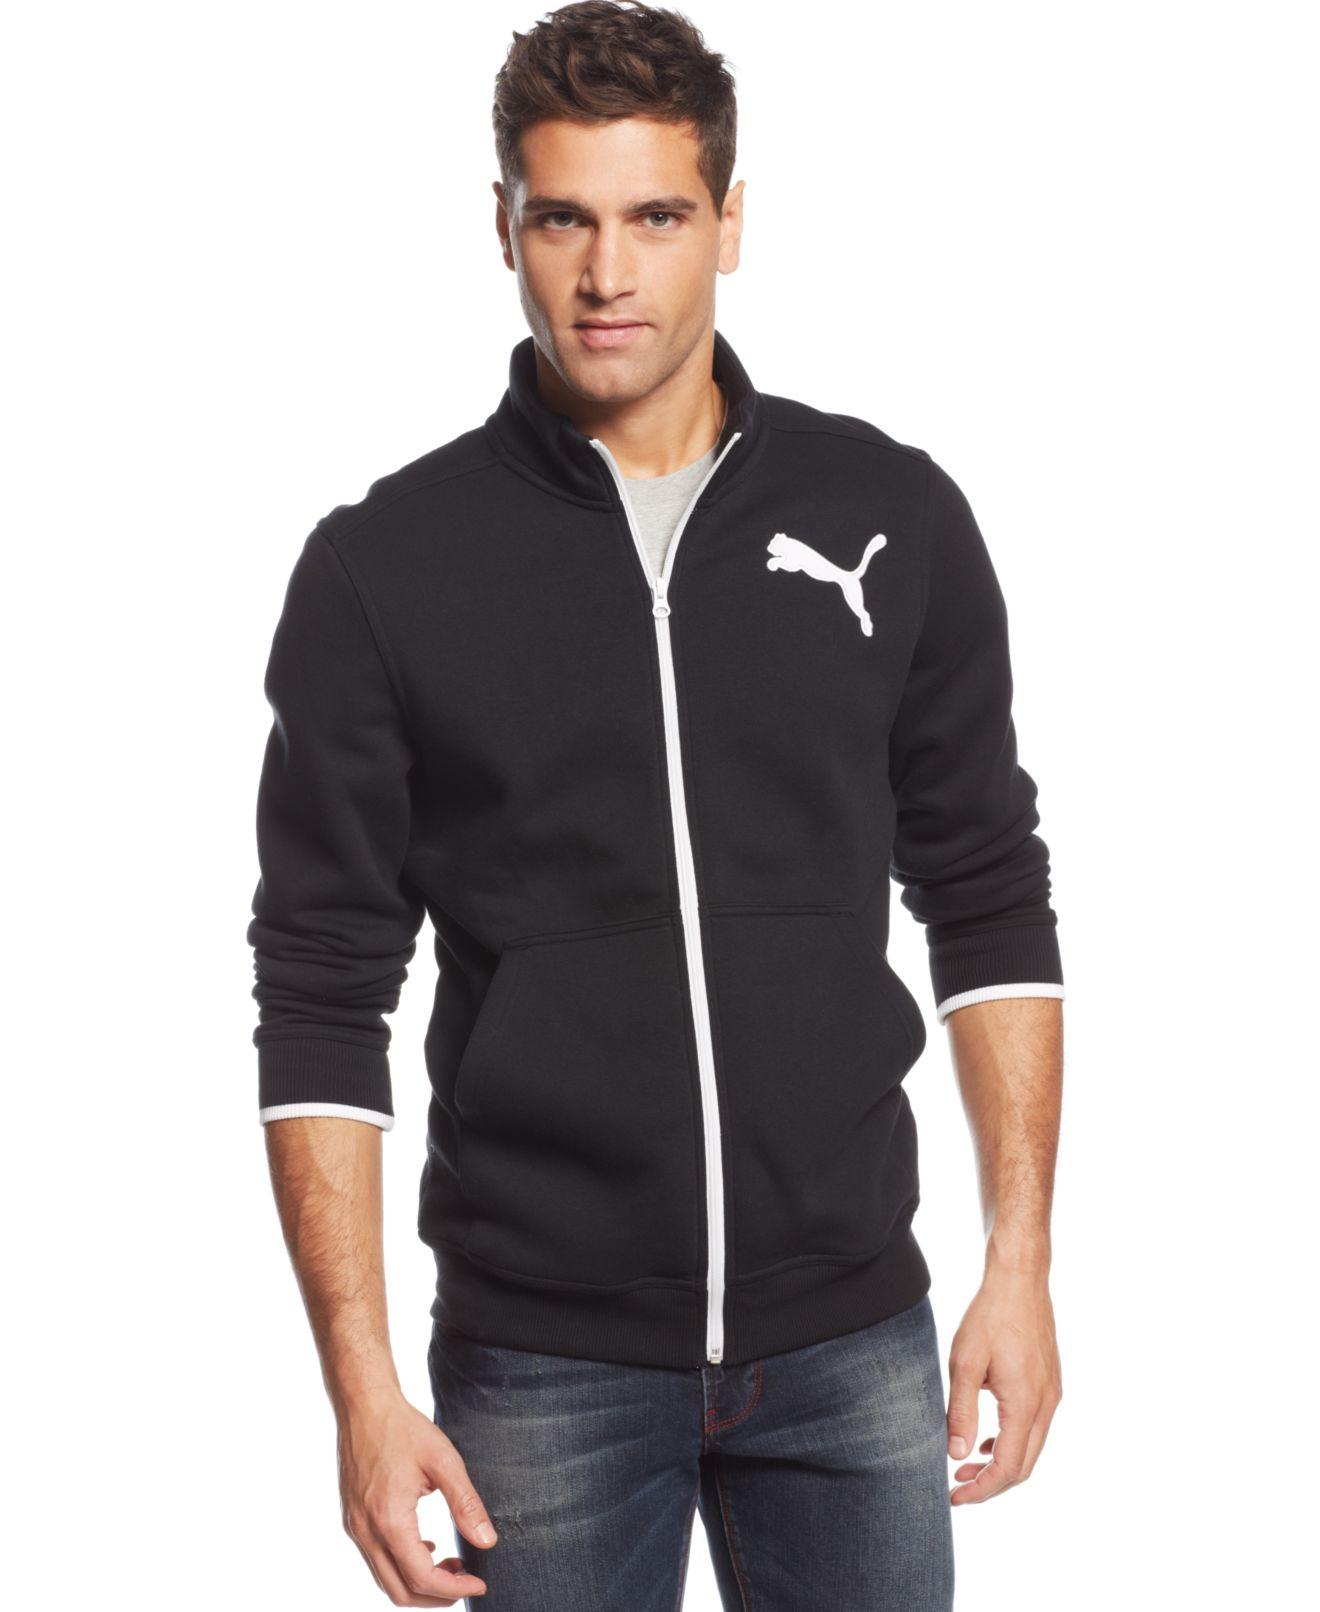 8ffav7sc Sale Puma Jumpsuits